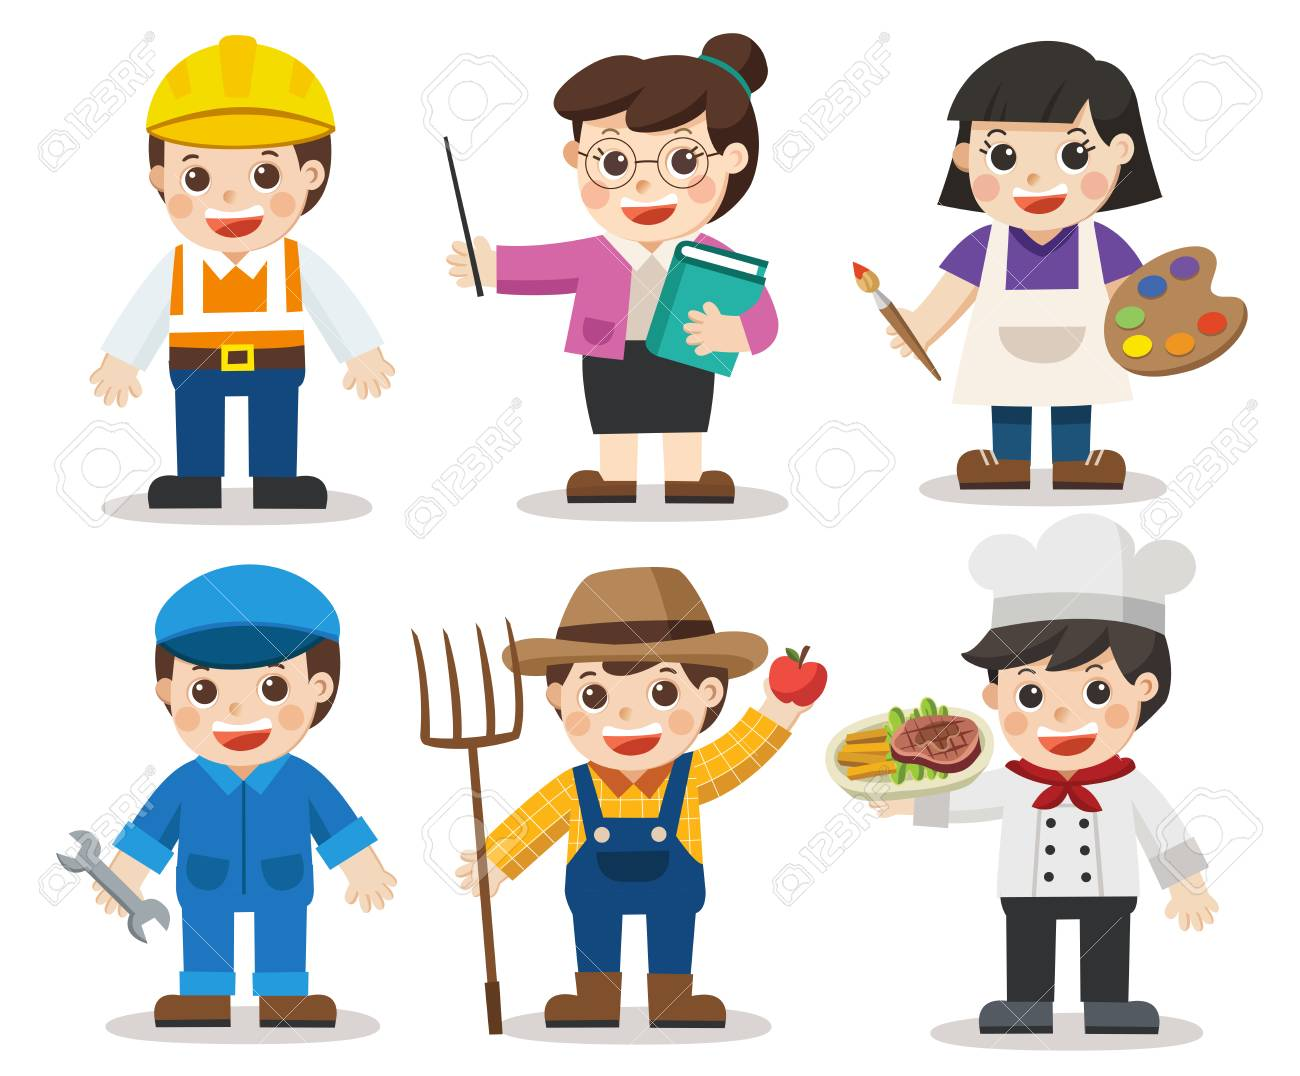 kid set of different professions artist teacher mechanic